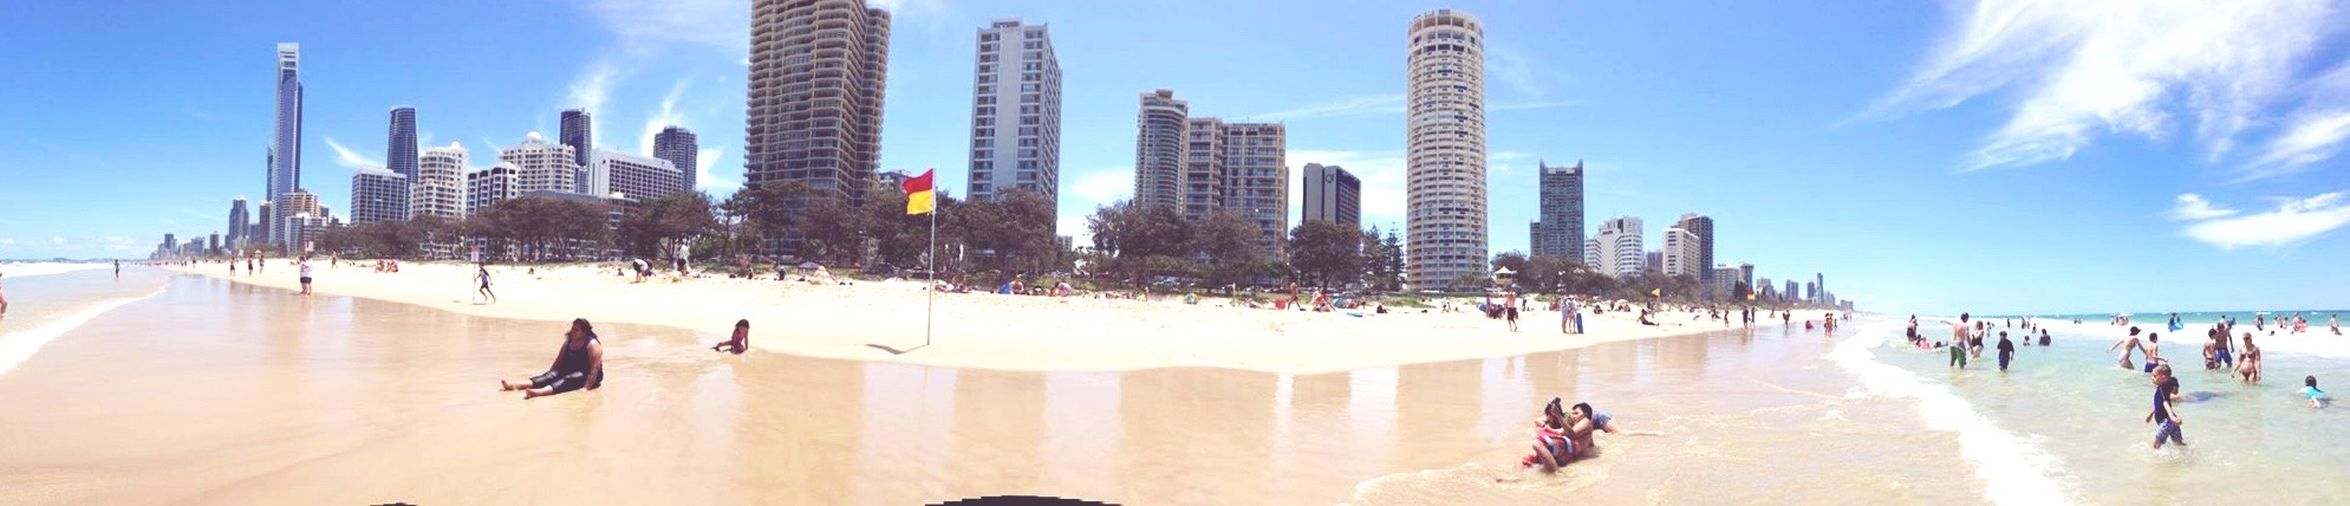 Sunshine Coast Beaches alongside it's beautiful city 🏖🏙 Lifestyles City Summer Coastline First Eyeem Photo